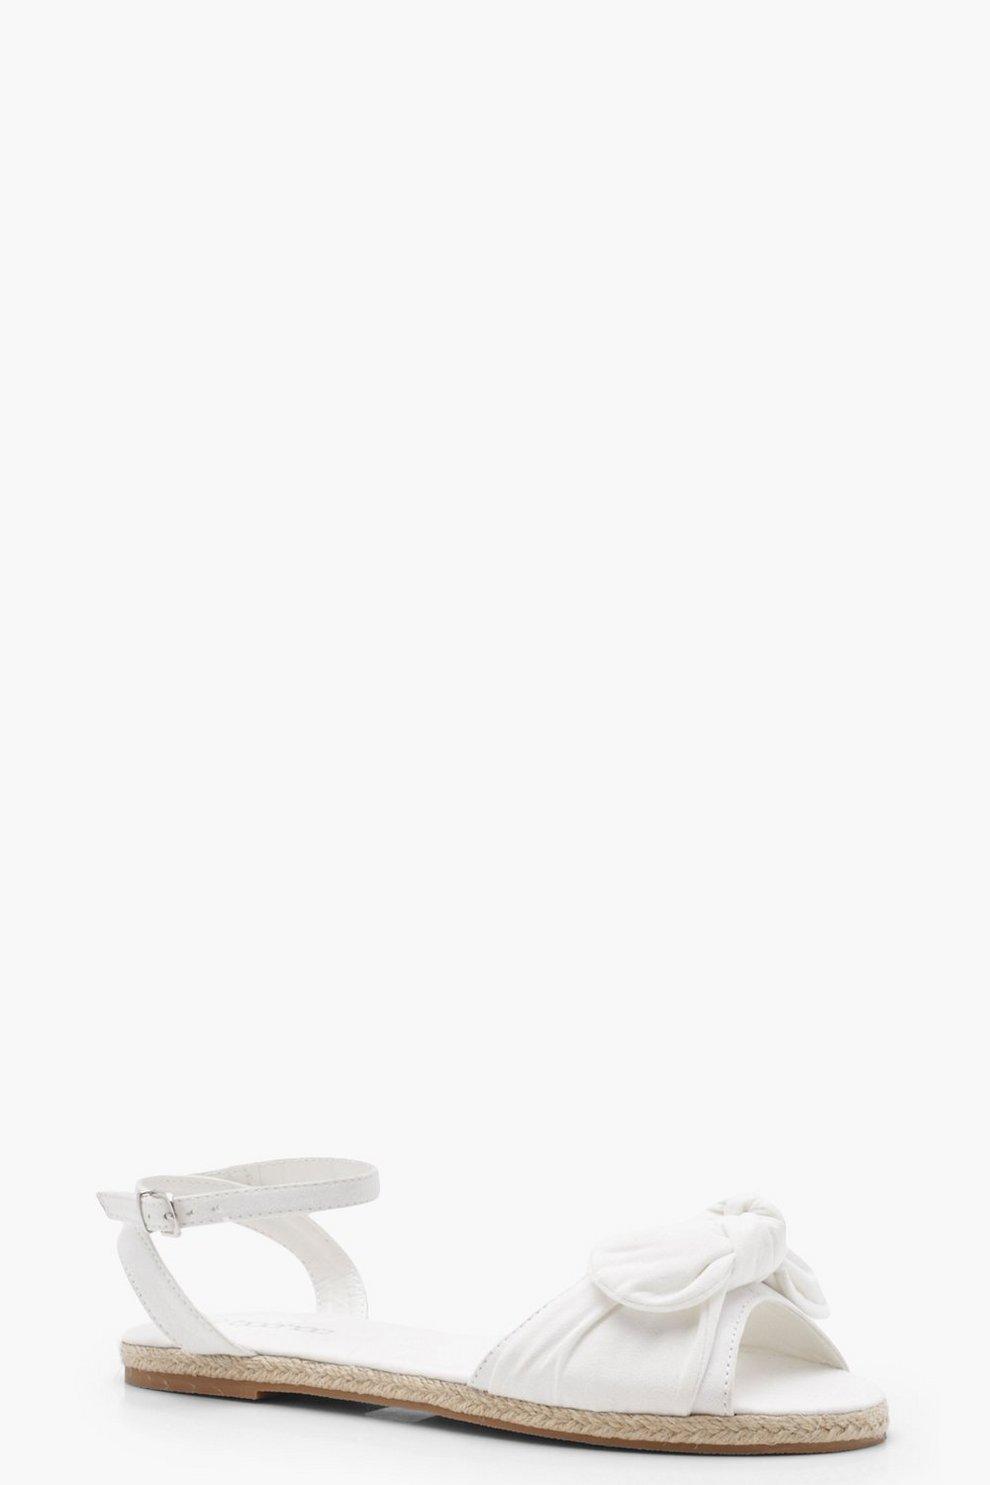 Lola Espadrille Bow Detail Sandals GGZgSk9s